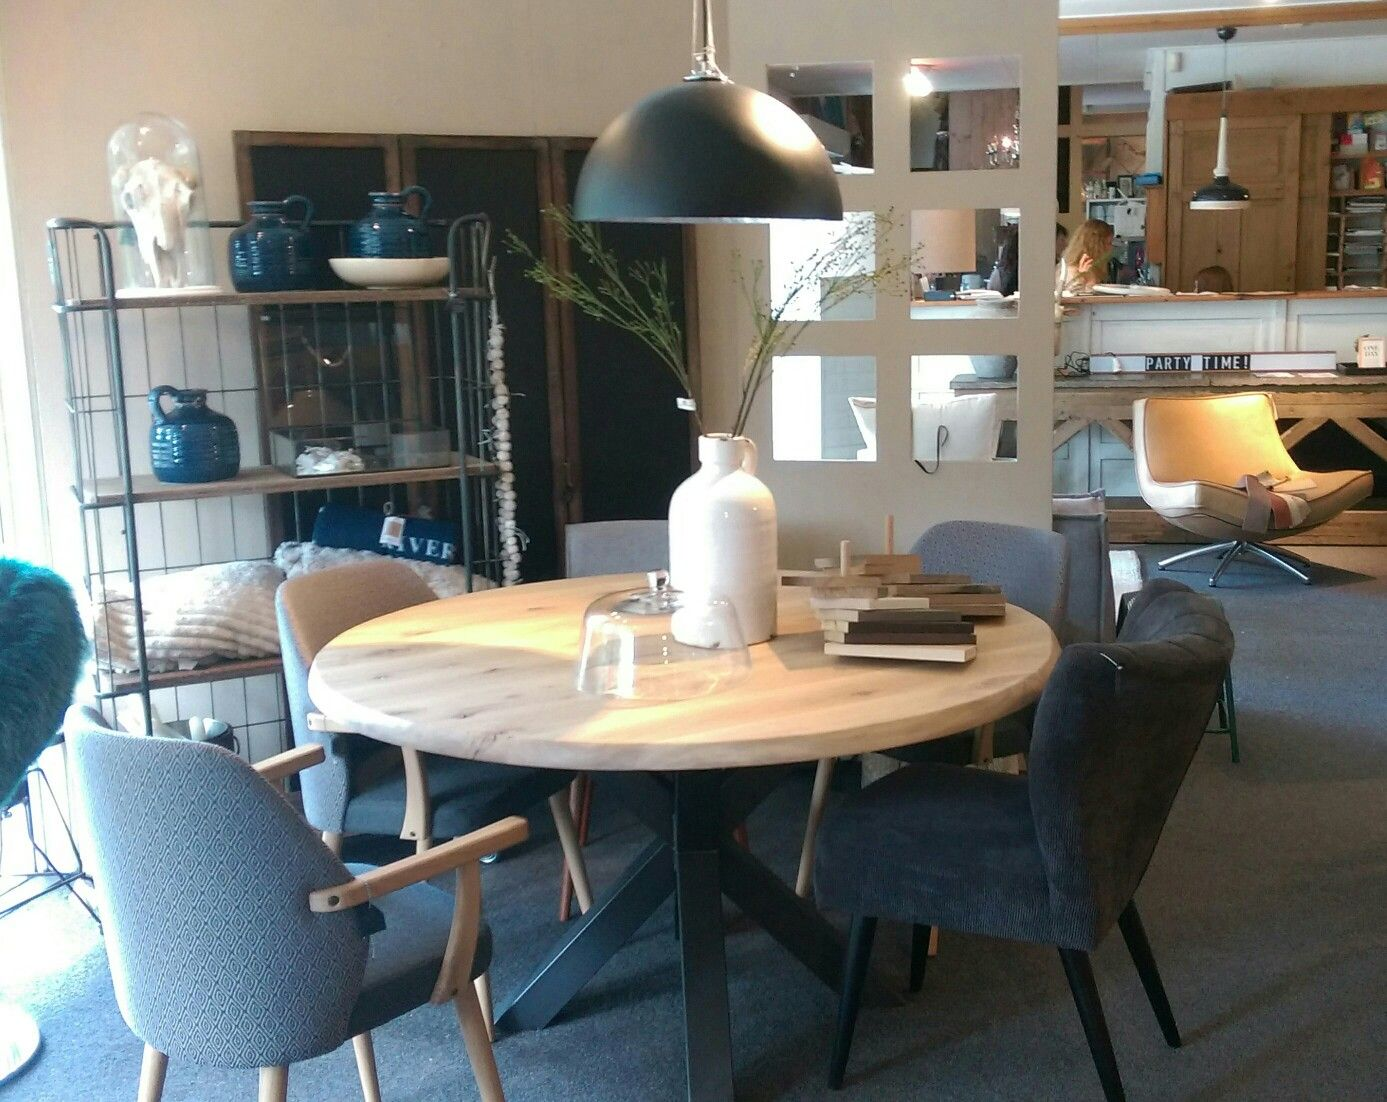 Wunderbar Küchentheke Stuhl Long Island Ny Galerie - Küche Set Ideen ...